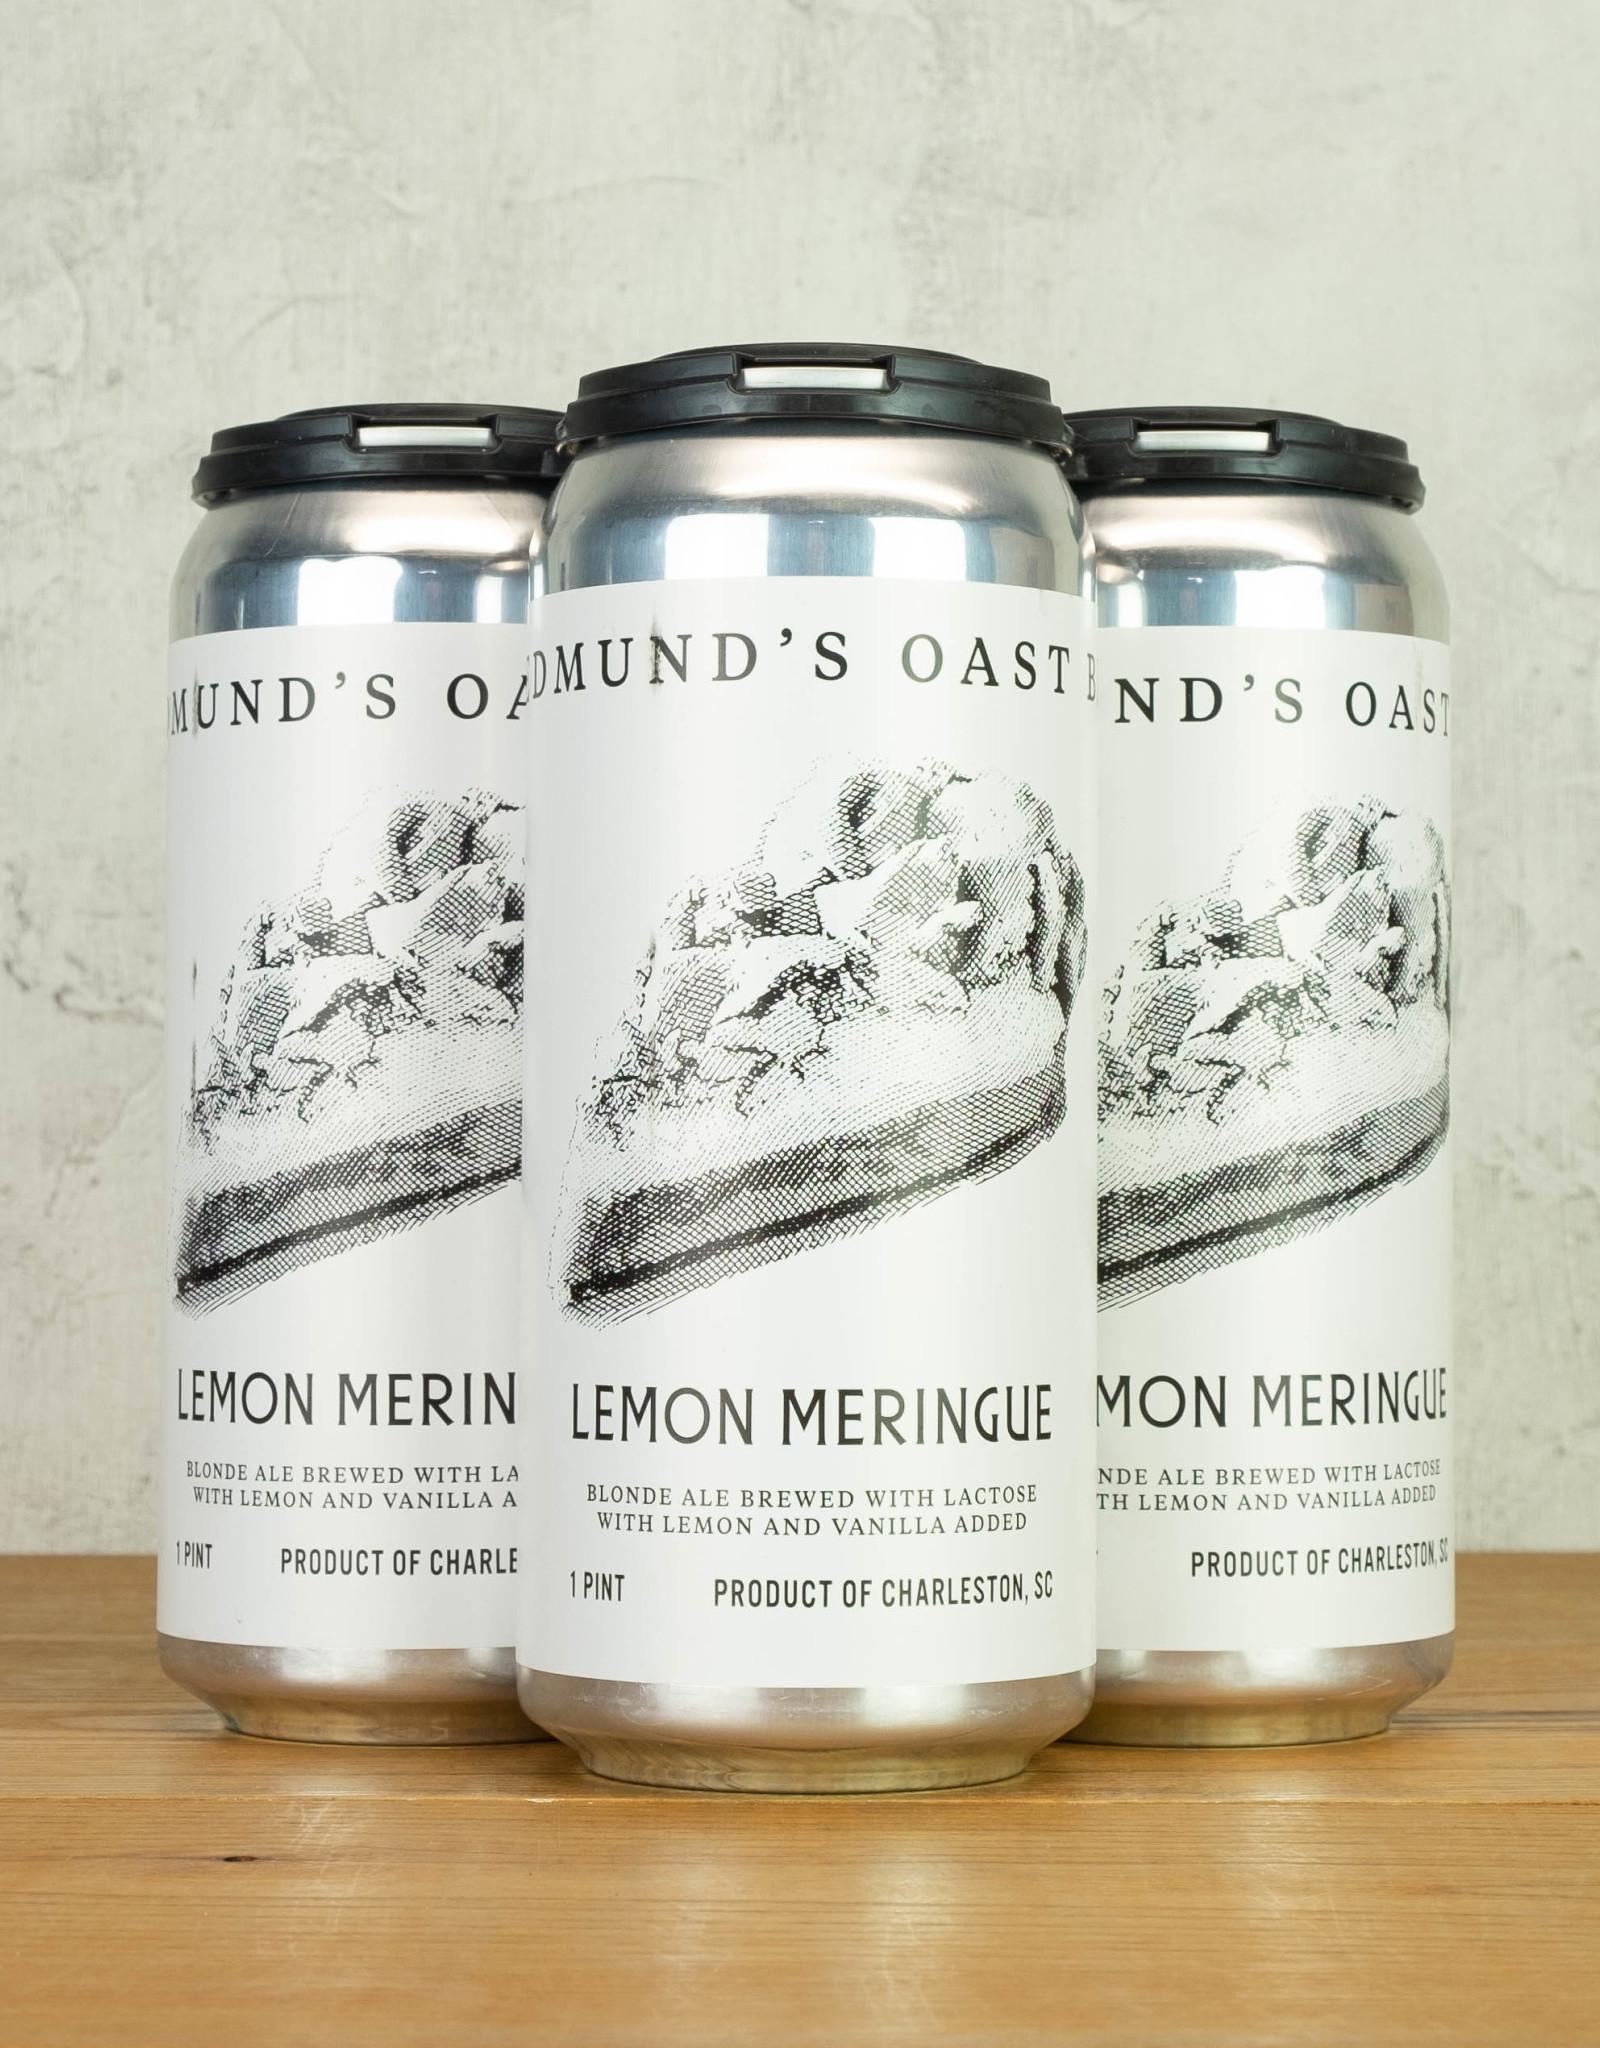 Edmund's Oast Lemon Meringue Blonde Ale 4pk